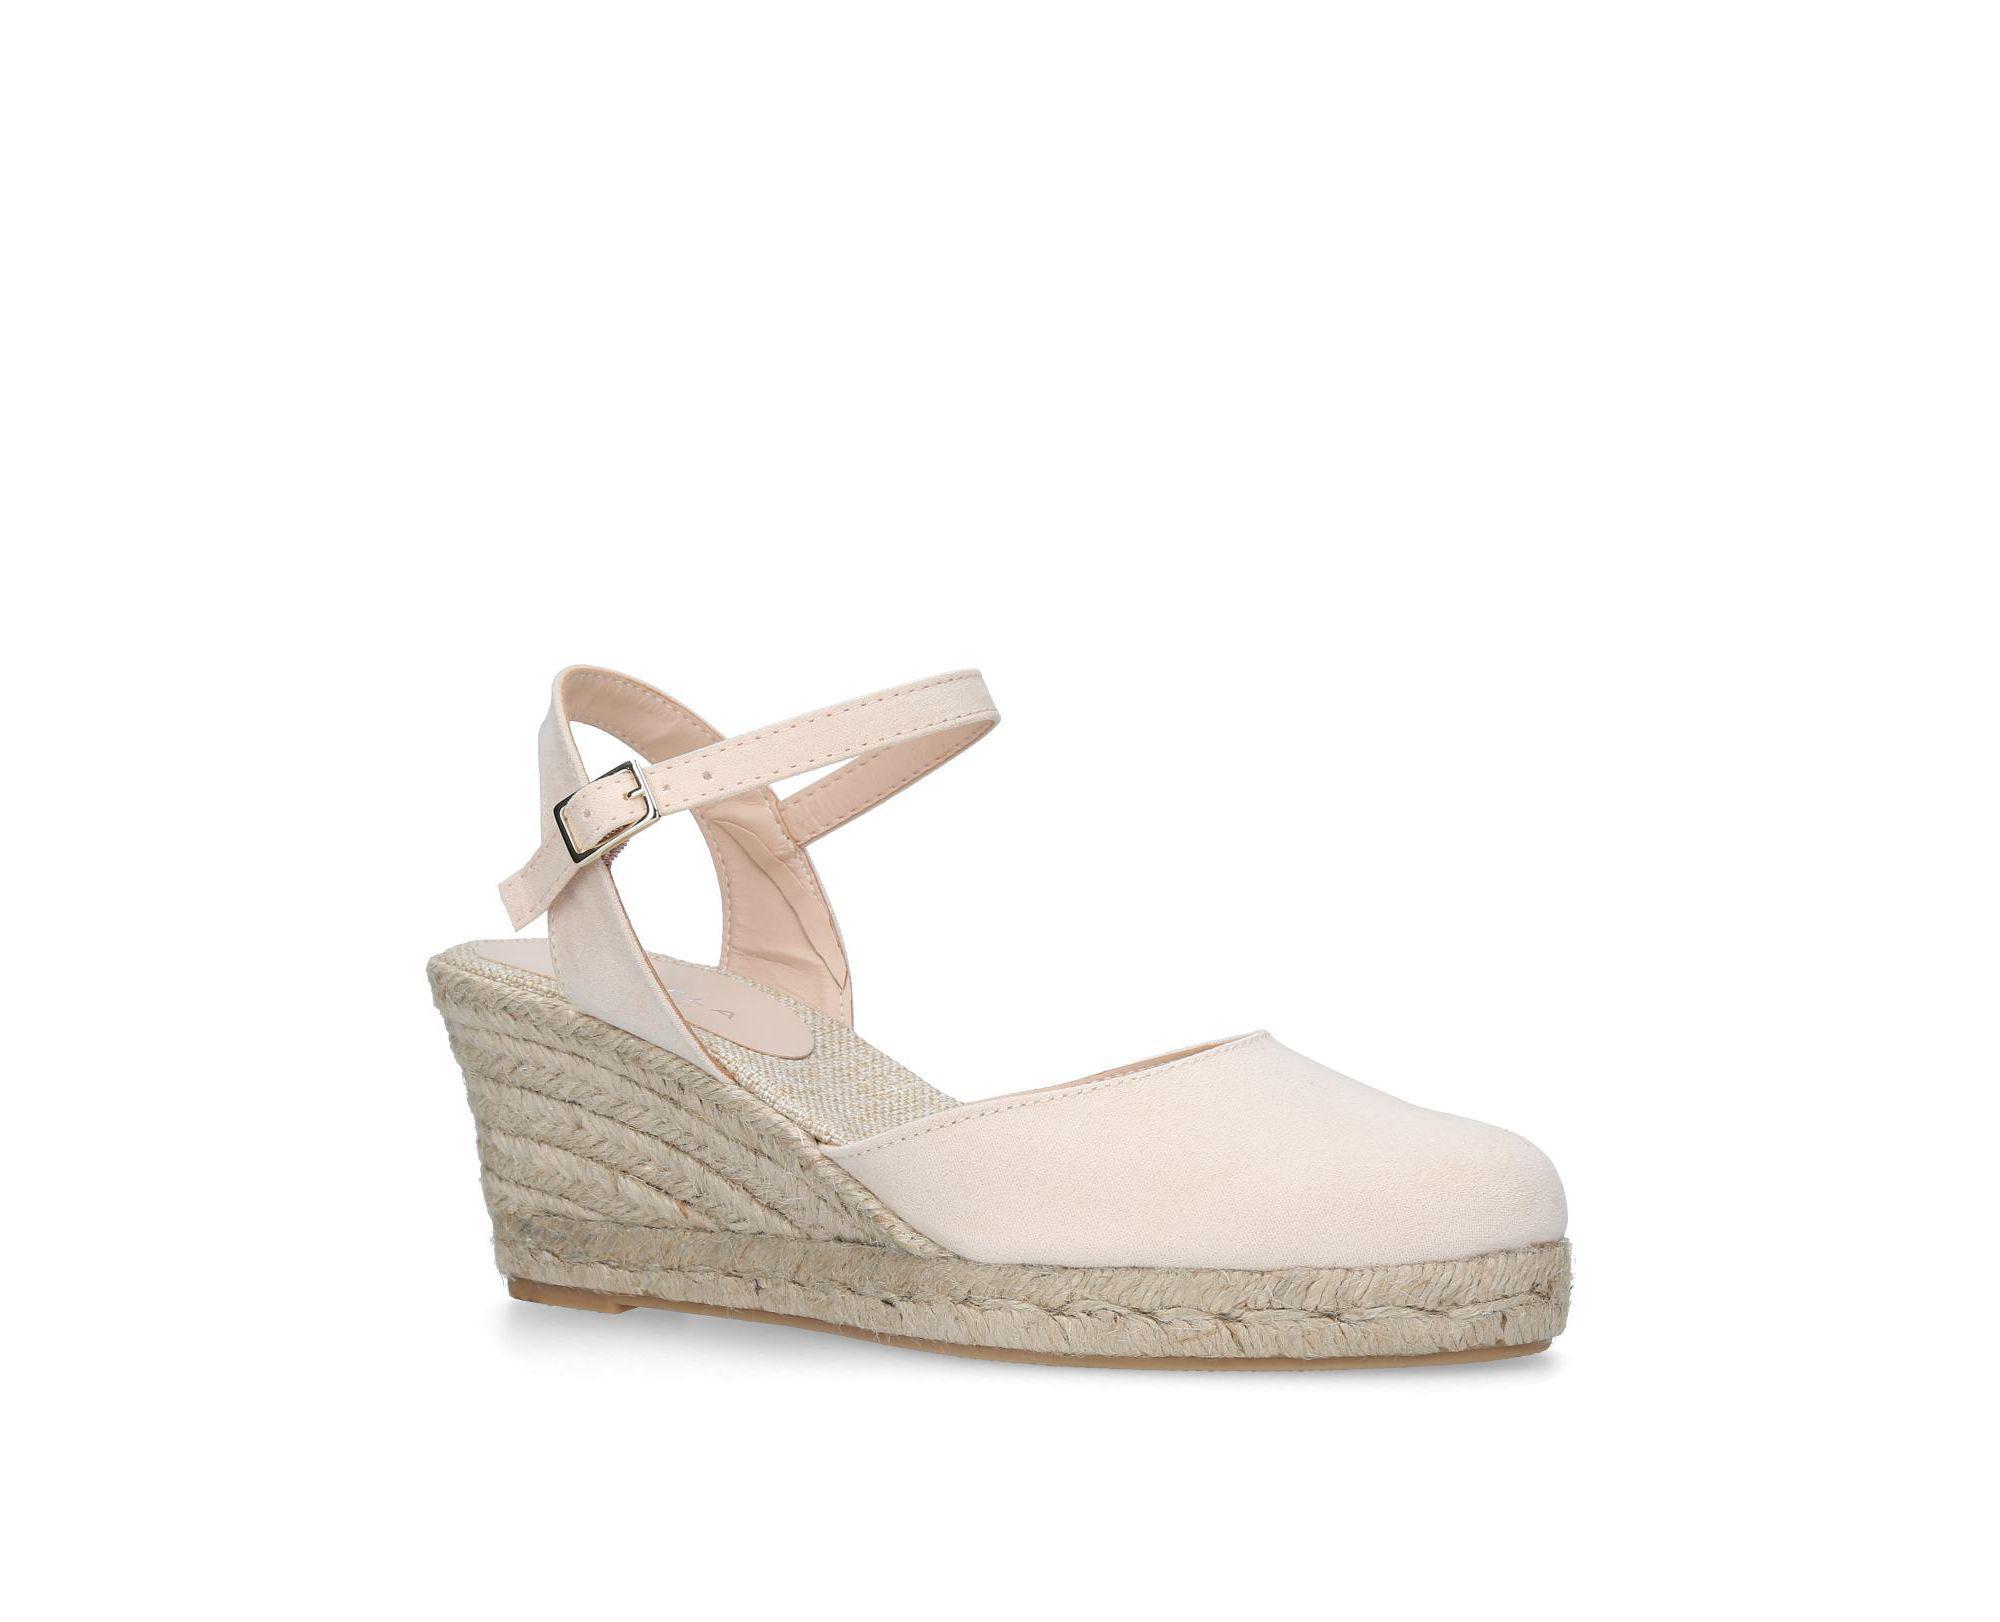 0ae33deb682 Carvela Kurt Geiger. Women s Natural Nude  sabrina 2  Mid Heel Wedge Sandals